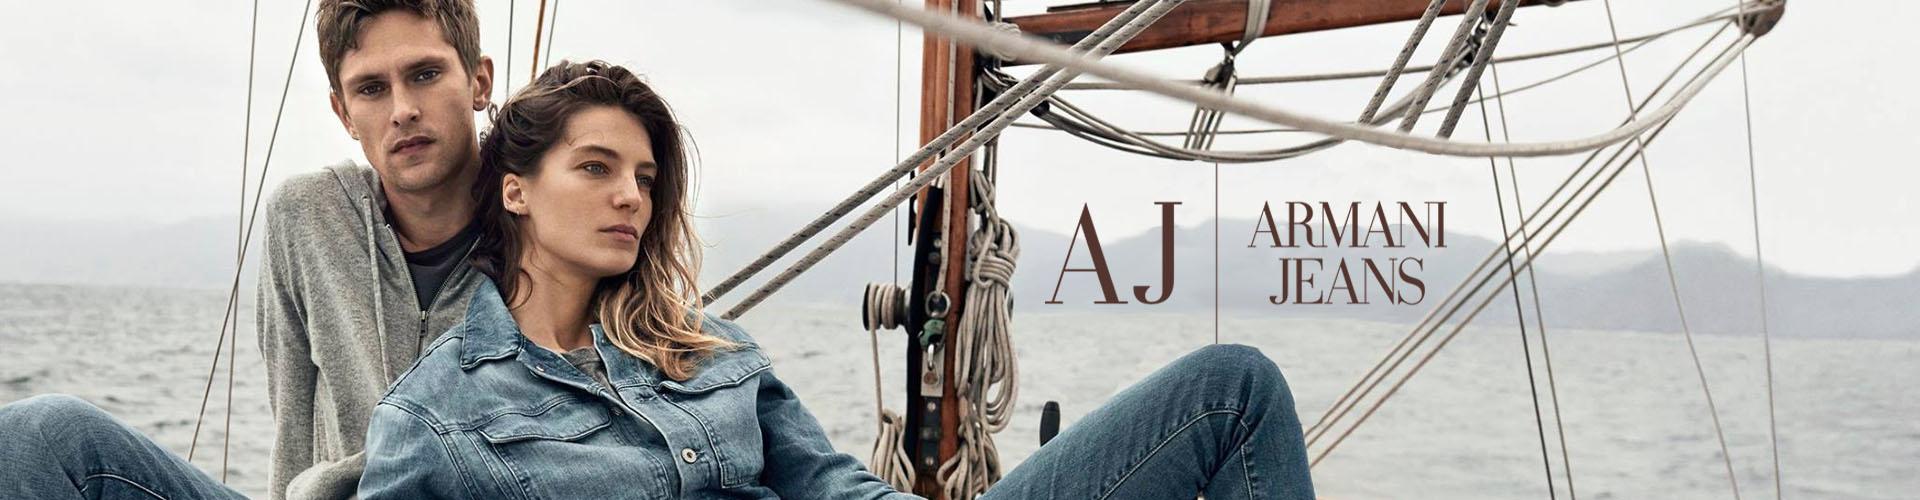 slide-accueil-armani-jeans